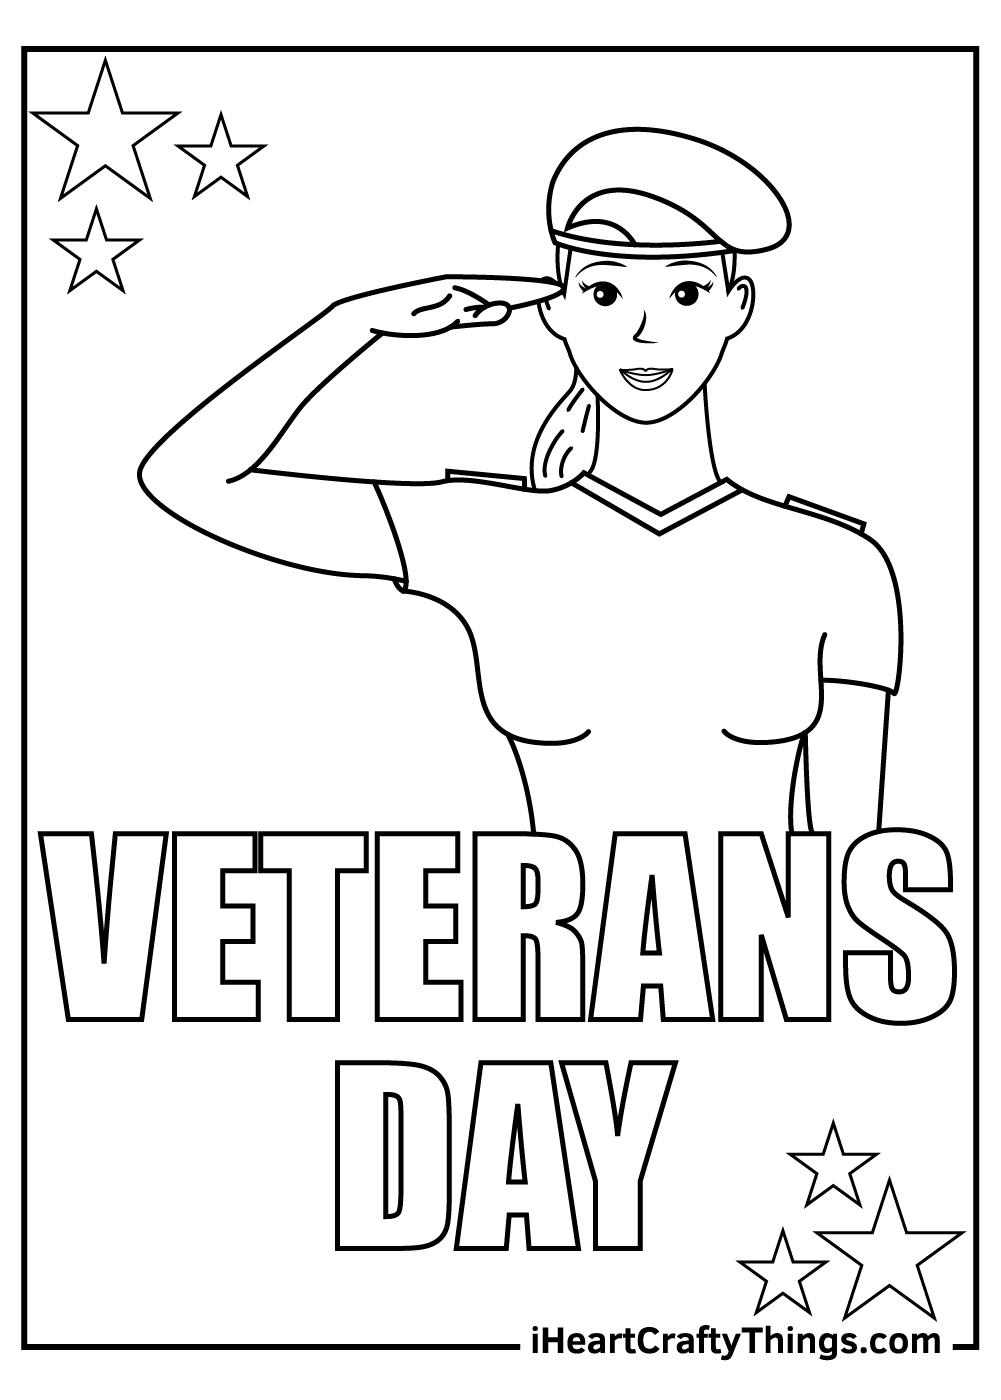 Veteran's Day Coloring Pages female veteran